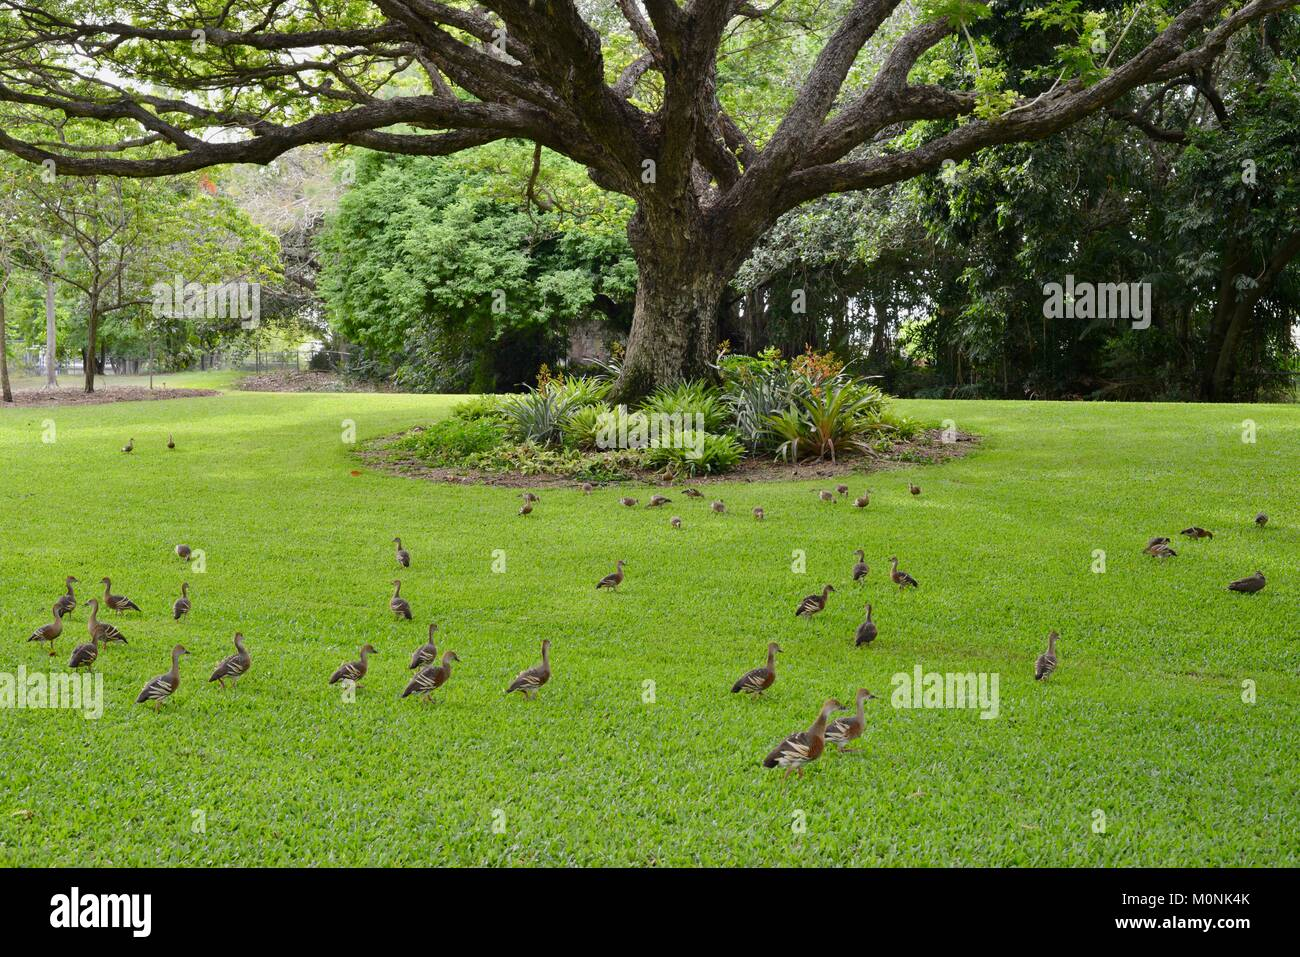 Flock of Whistling ducks under a raintree, Anderson Park Botanic Gardens, Townsville, Queensland, Australia Stock Photo